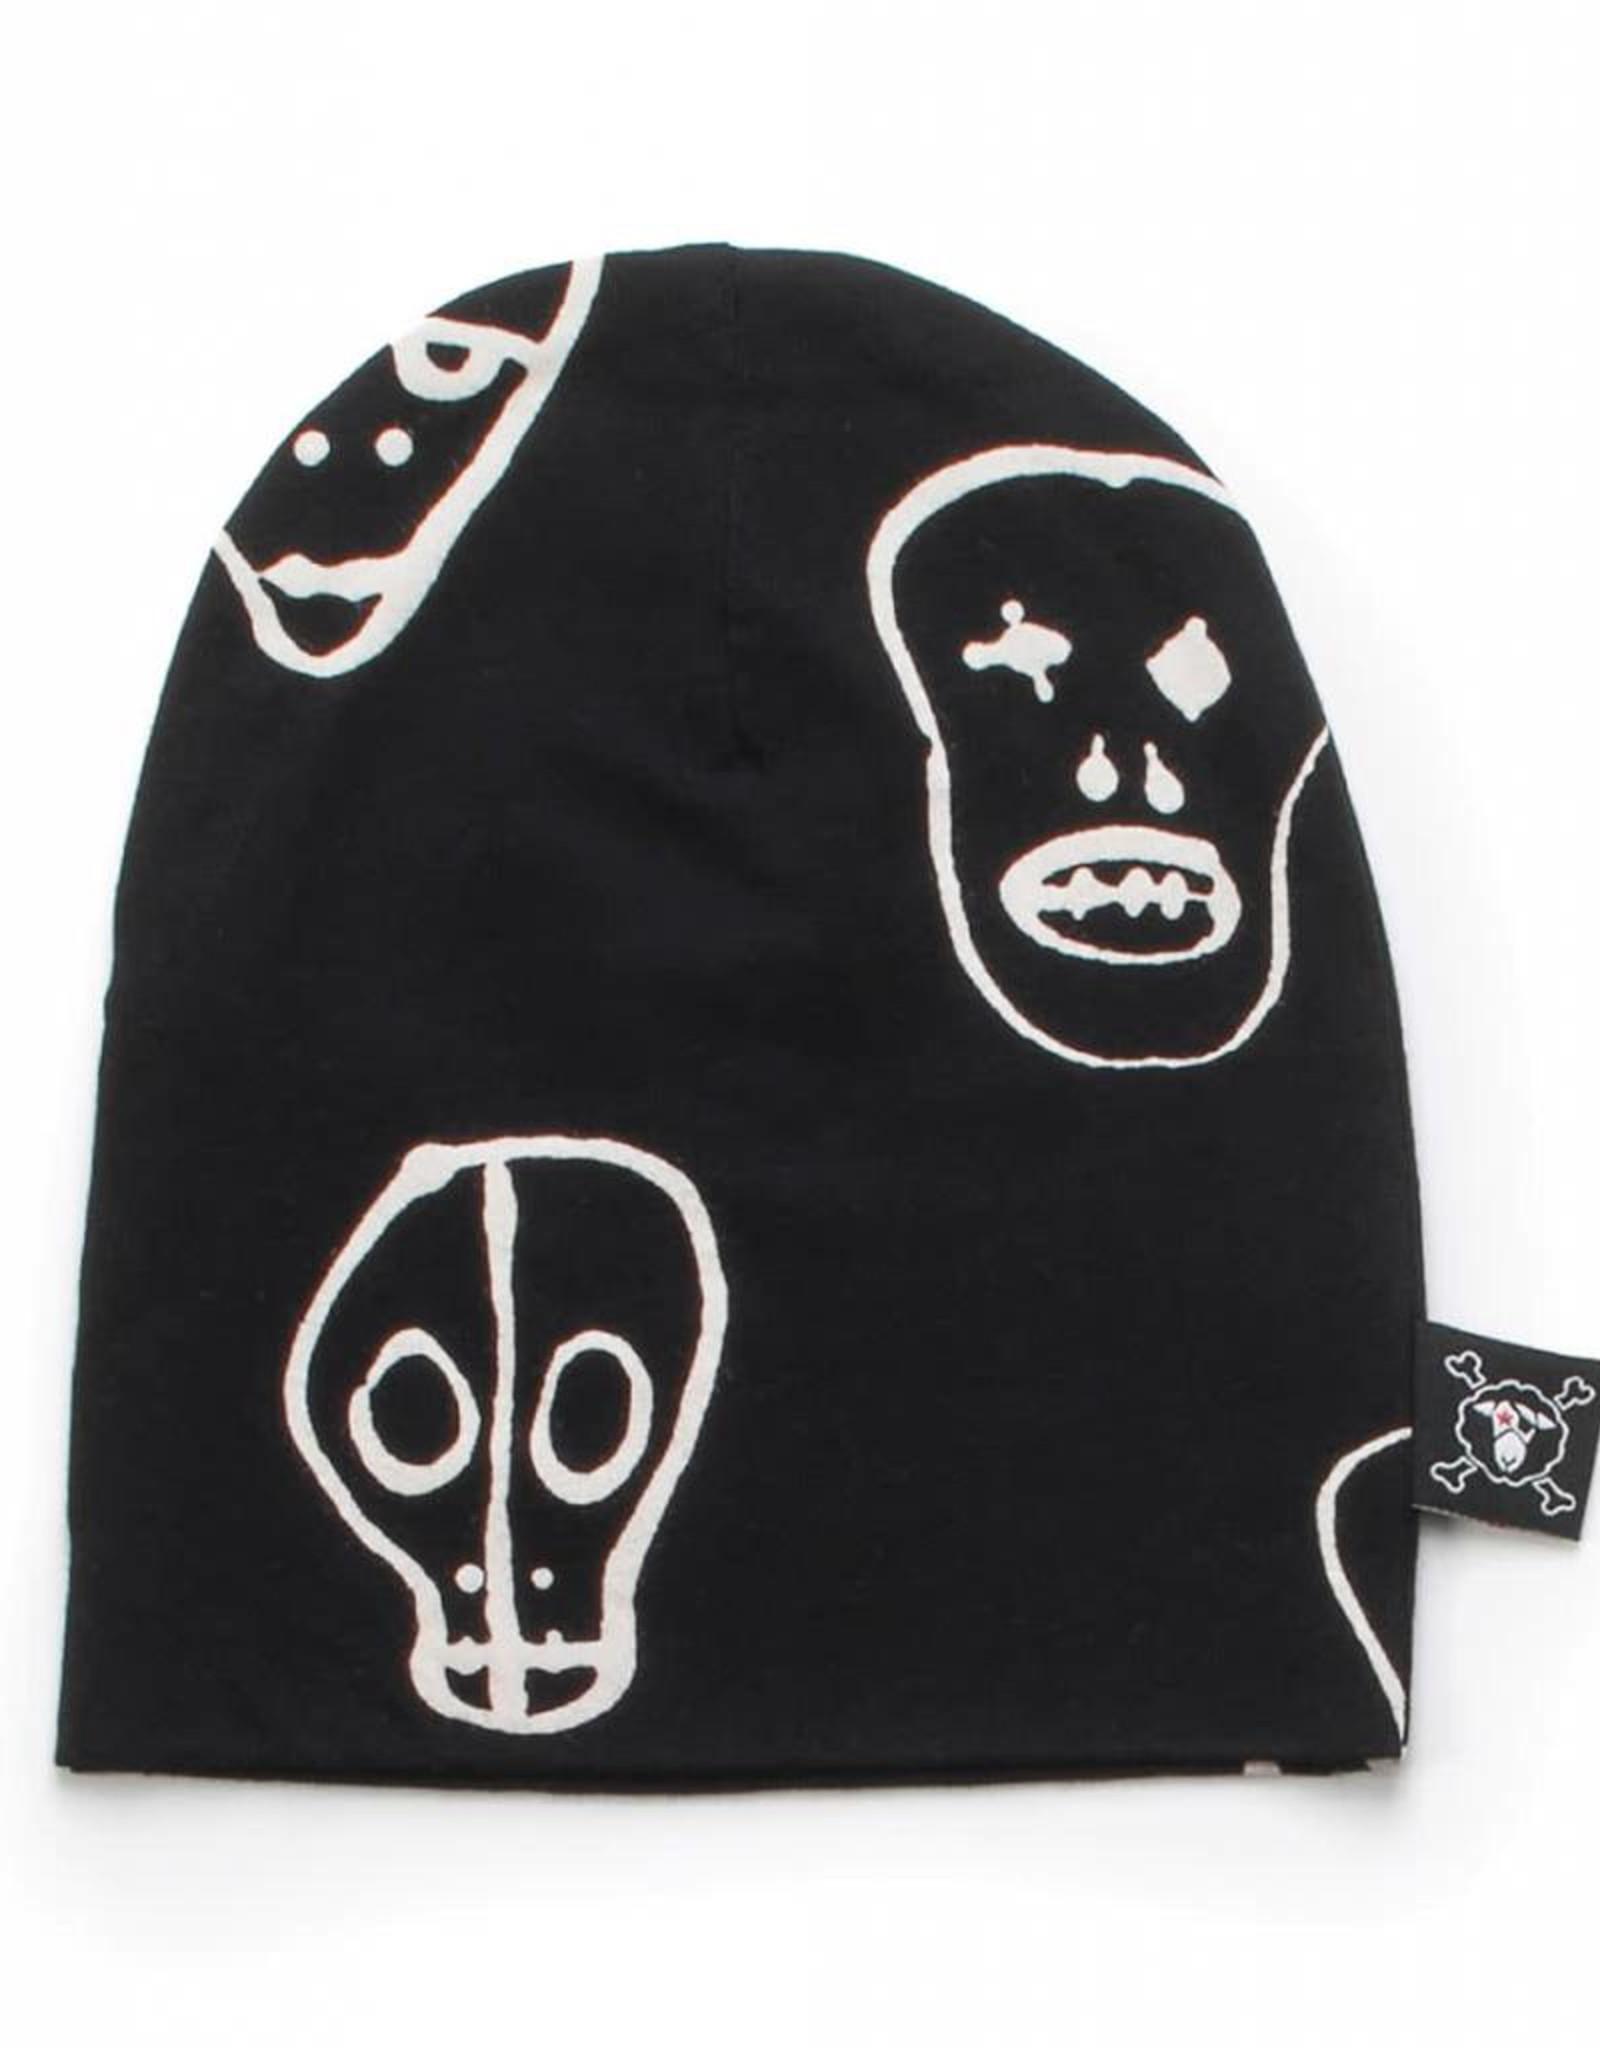 Beanie hat, skull print